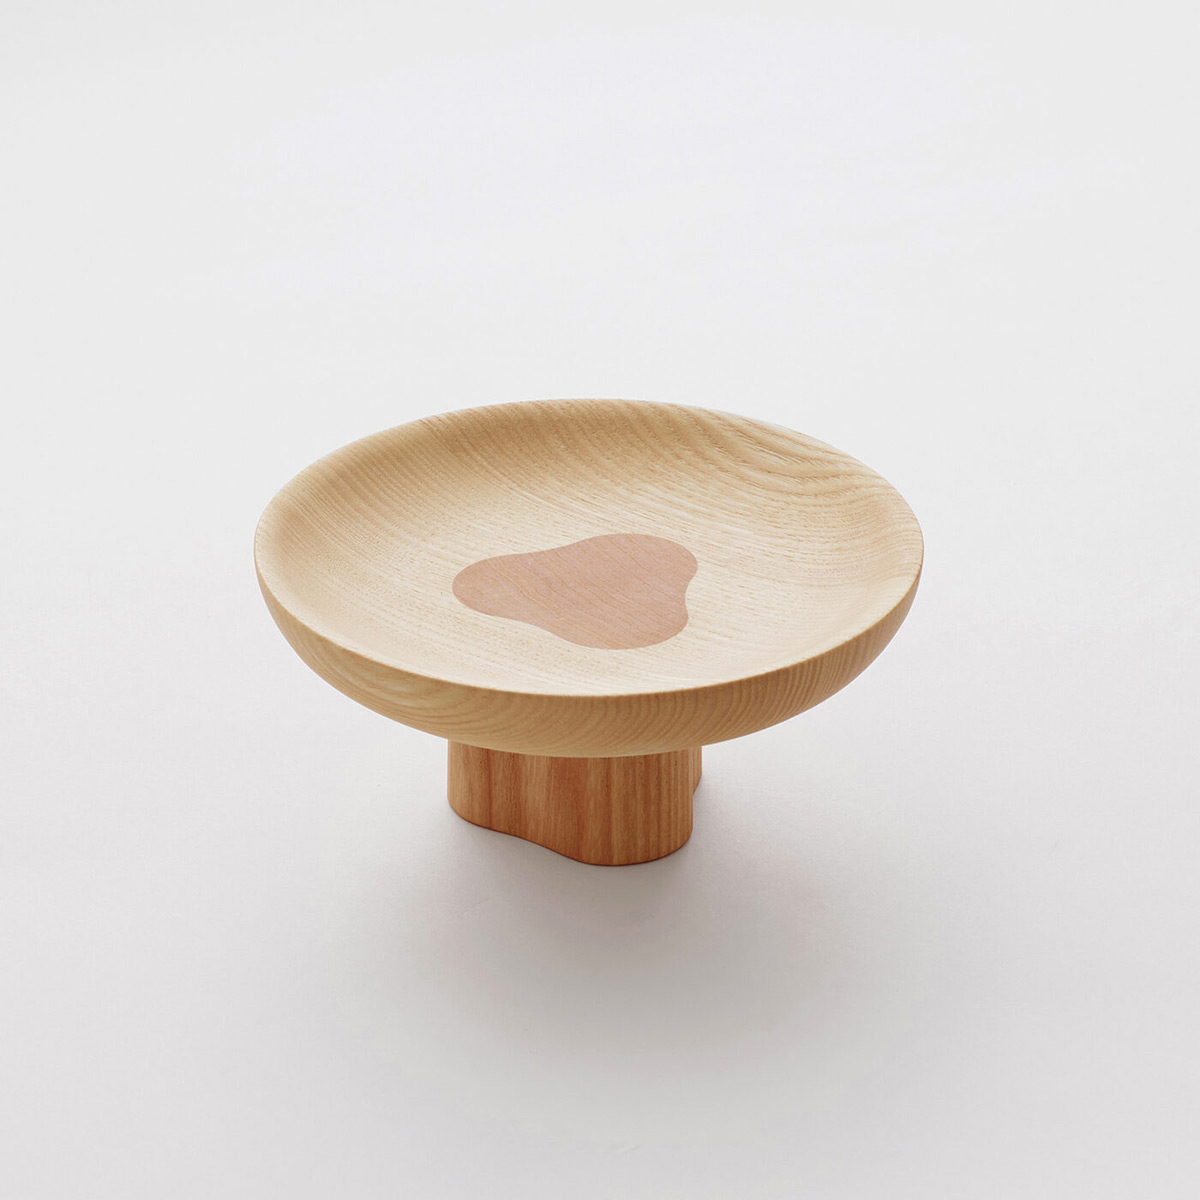 Portobello-Bowls-Julie-Richoz-Mattiazzi-01